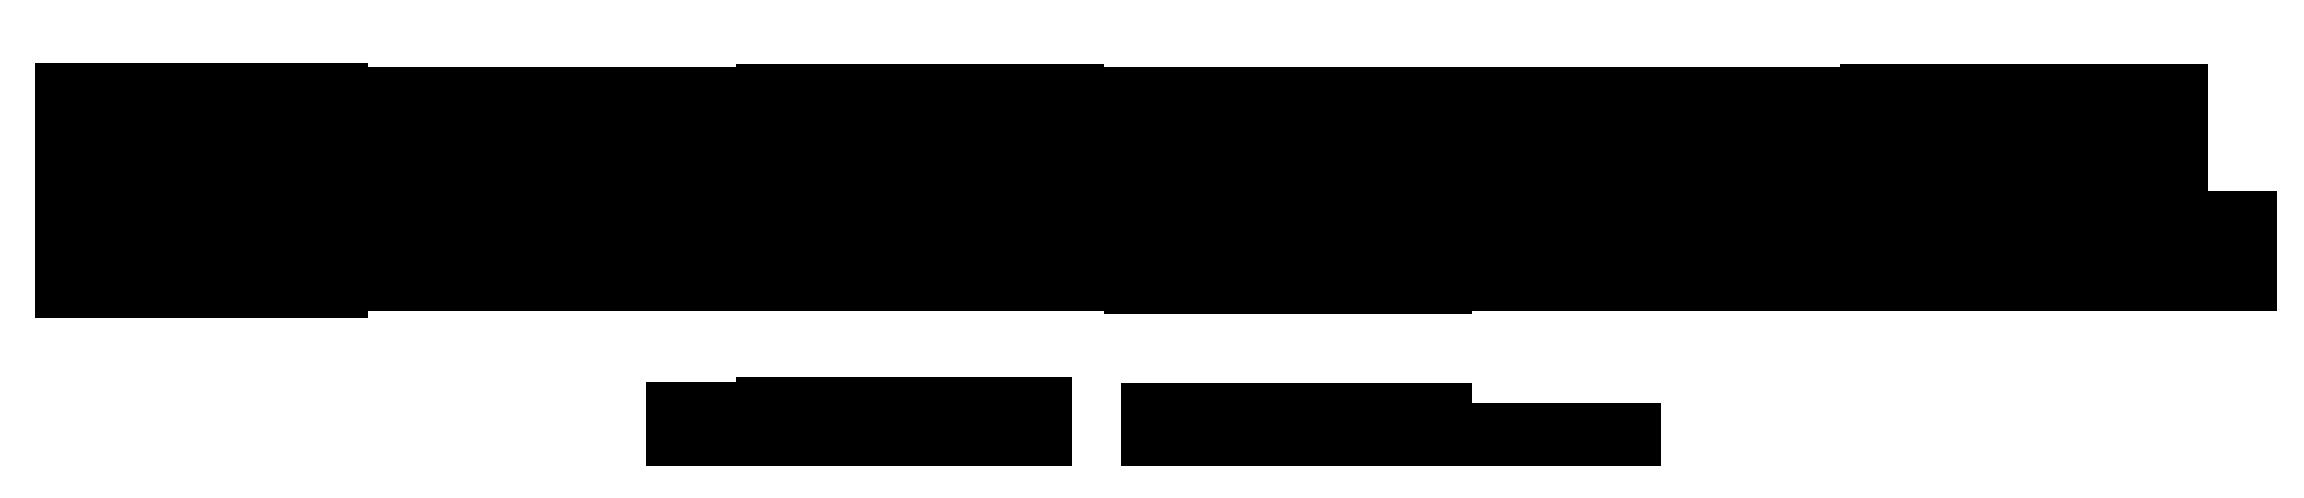 Calabretta - Sartorial Menswear